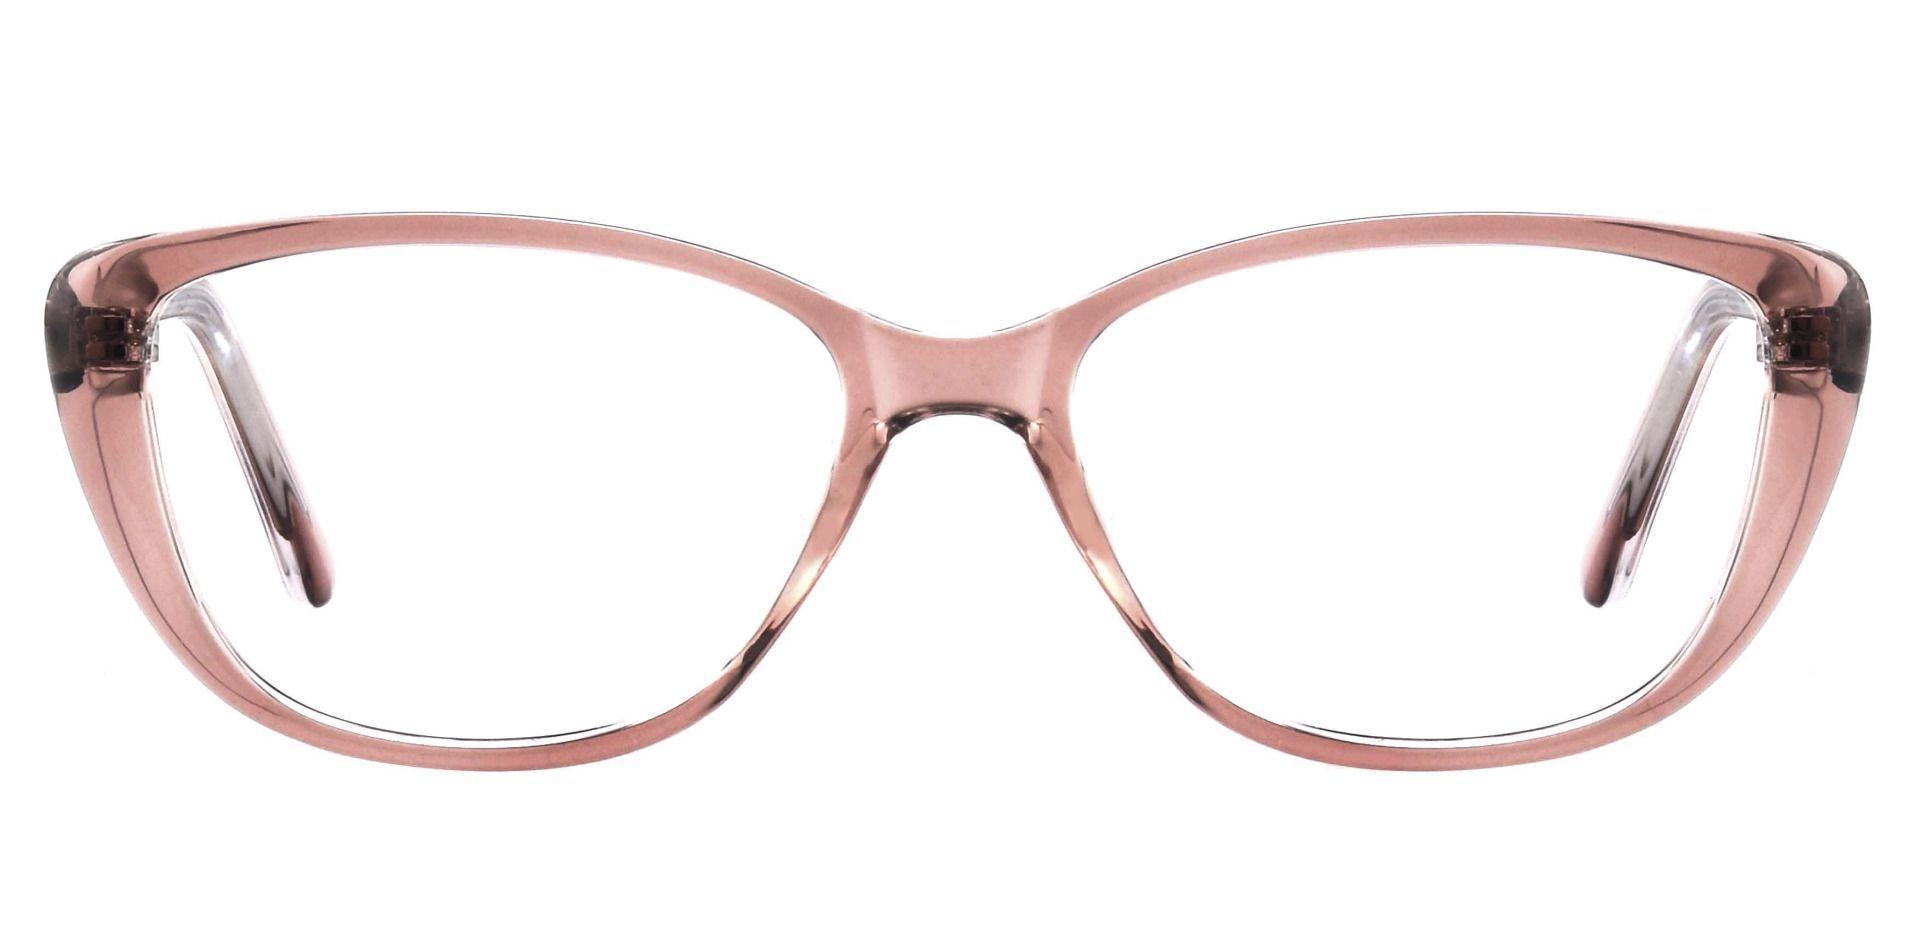 Sicily Cat Eye Prescription Glasses - Brown